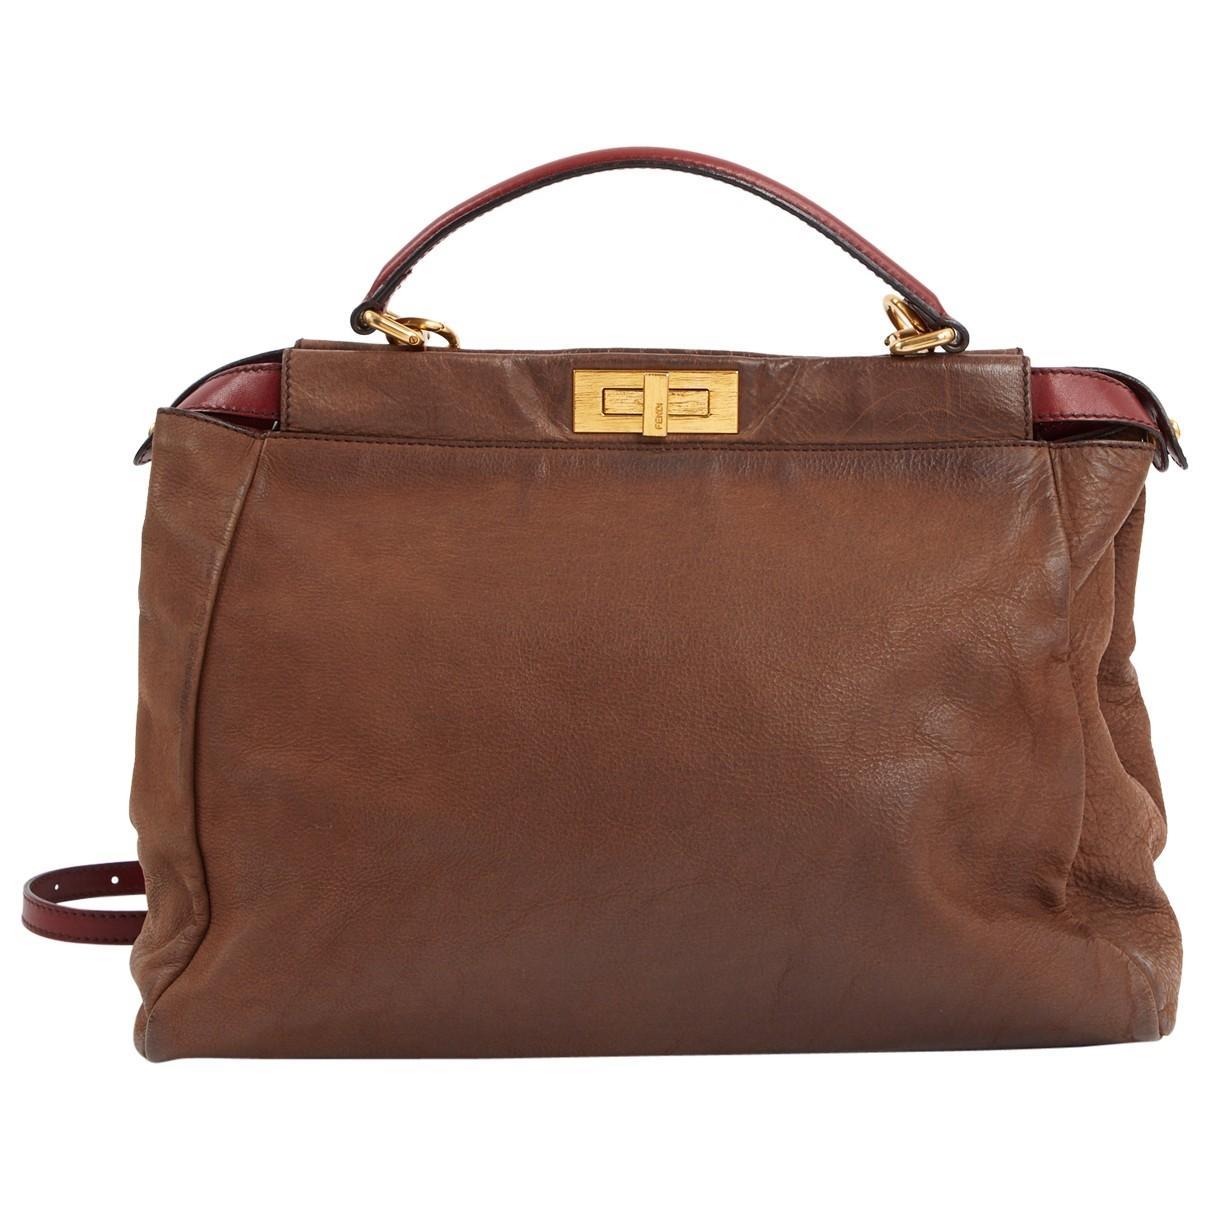 5d72a0352a04 Lyst - Fendi Pre-owned Peekaboo Brown Leather Handbags in Brown